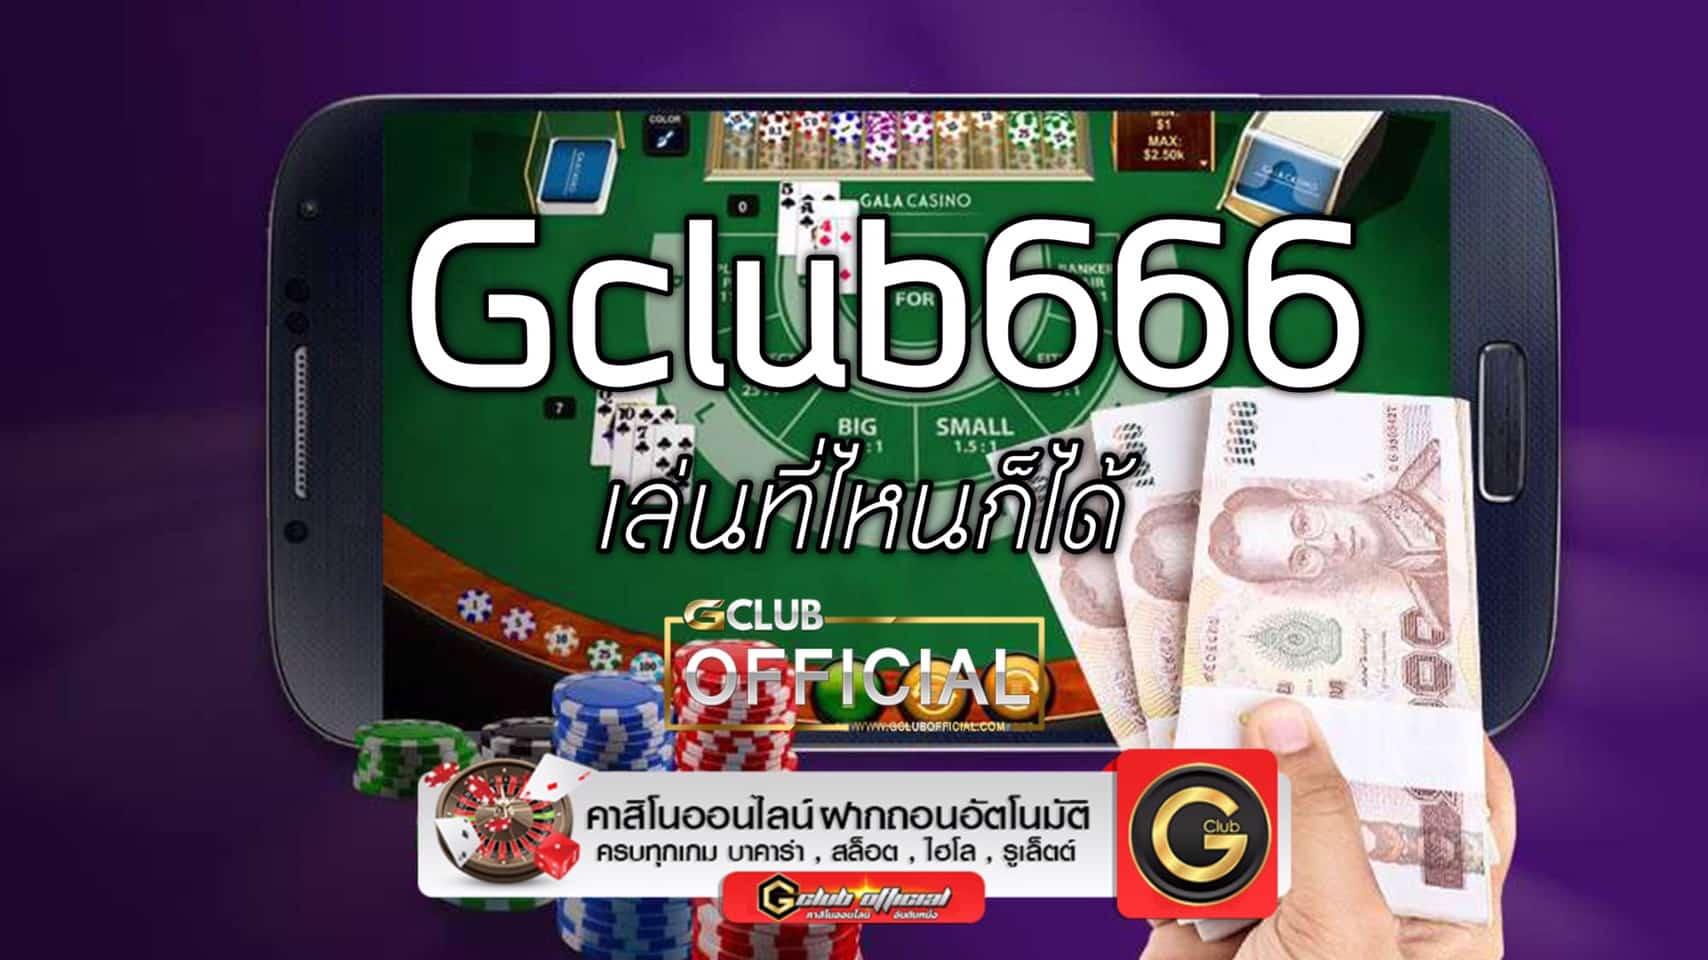 gclub666 เล่นผ่านมือถือ เล่นที่ไหนก็ได้